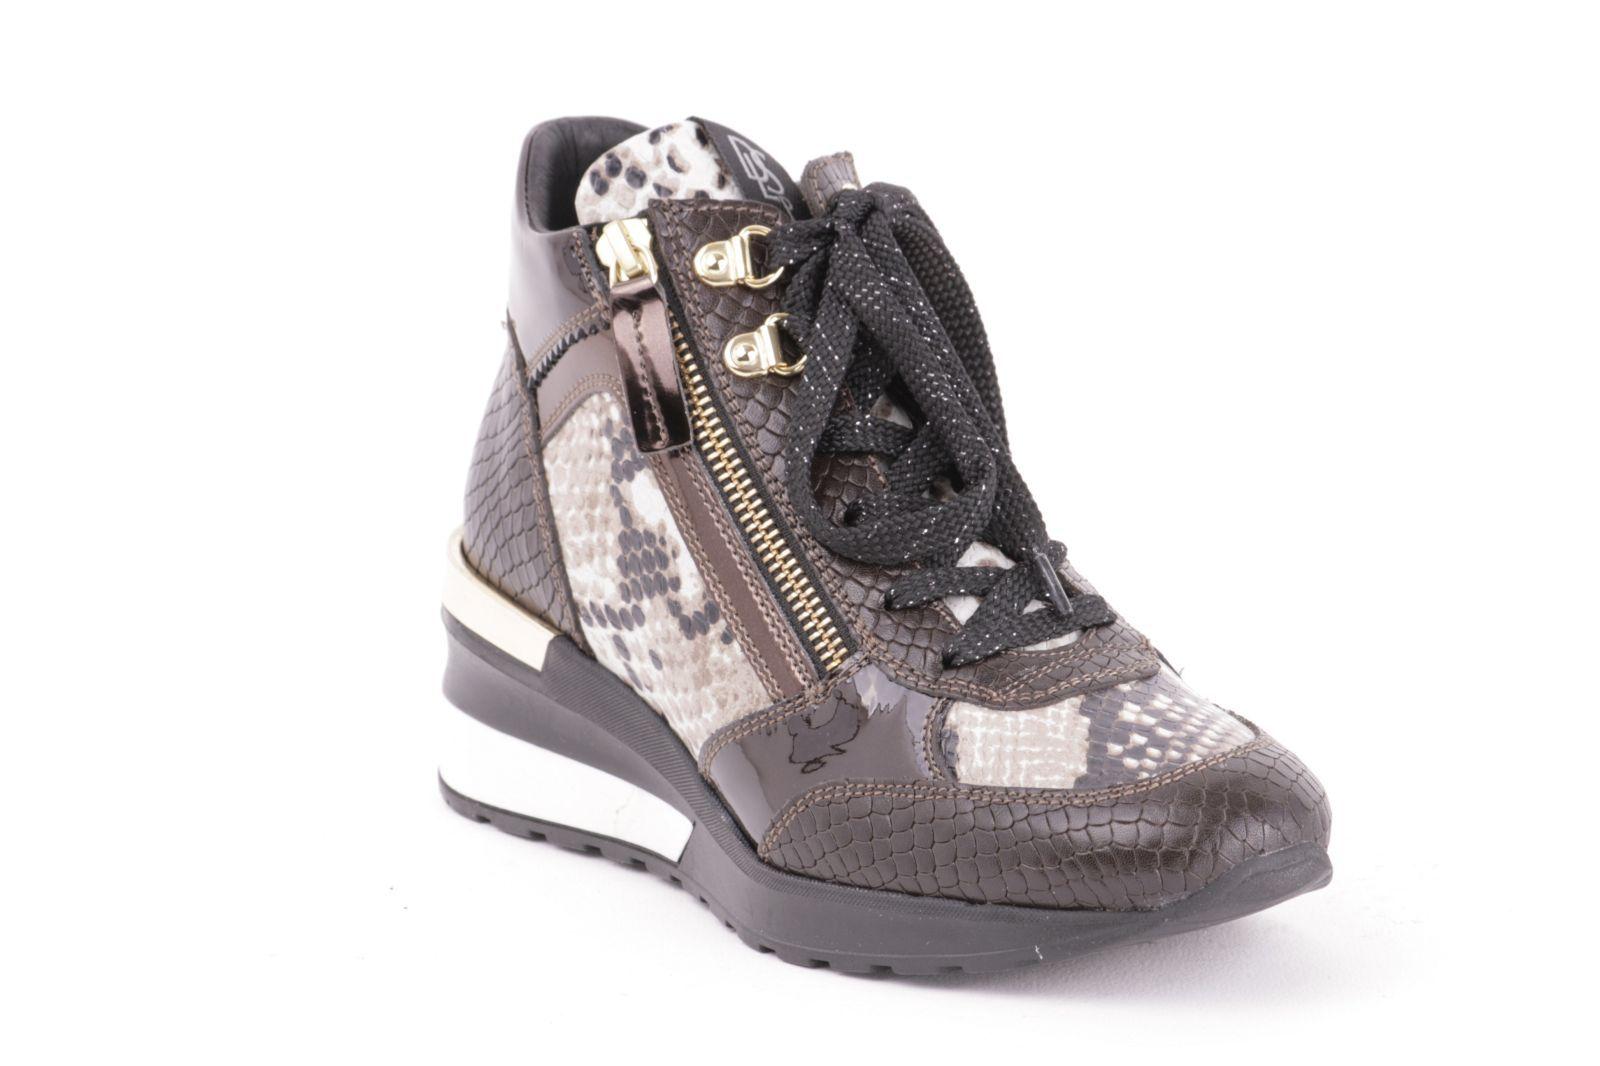 c4ee48ef1ae DL Sport Sneaker Bruin dames (4484 - 4484) - Rigi